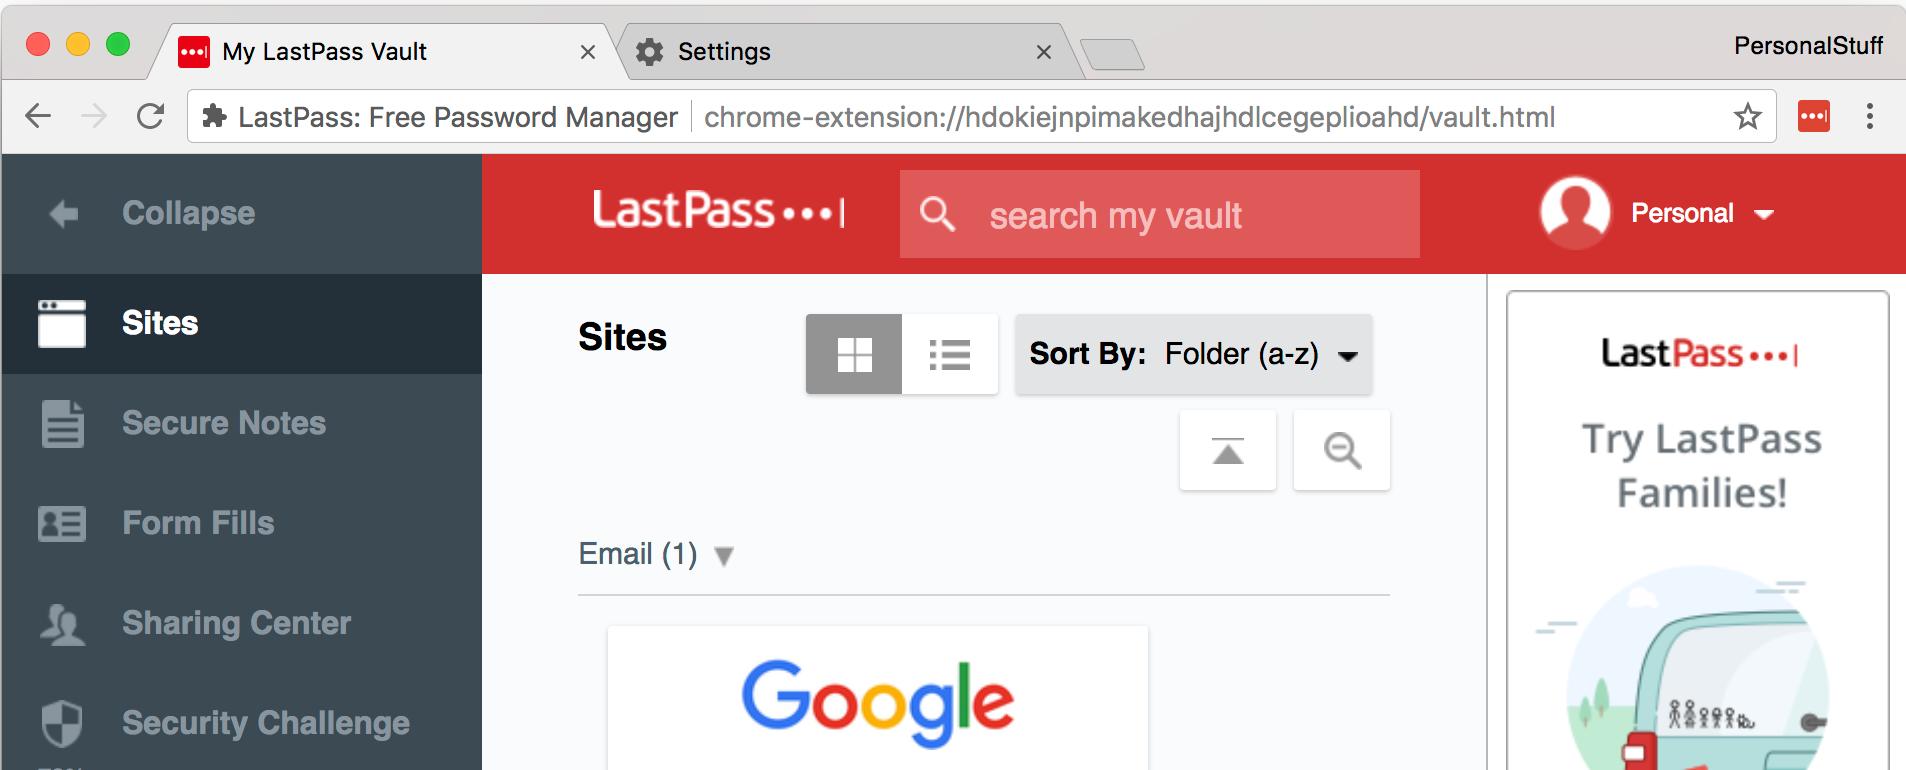 LastPass vault using personal identity